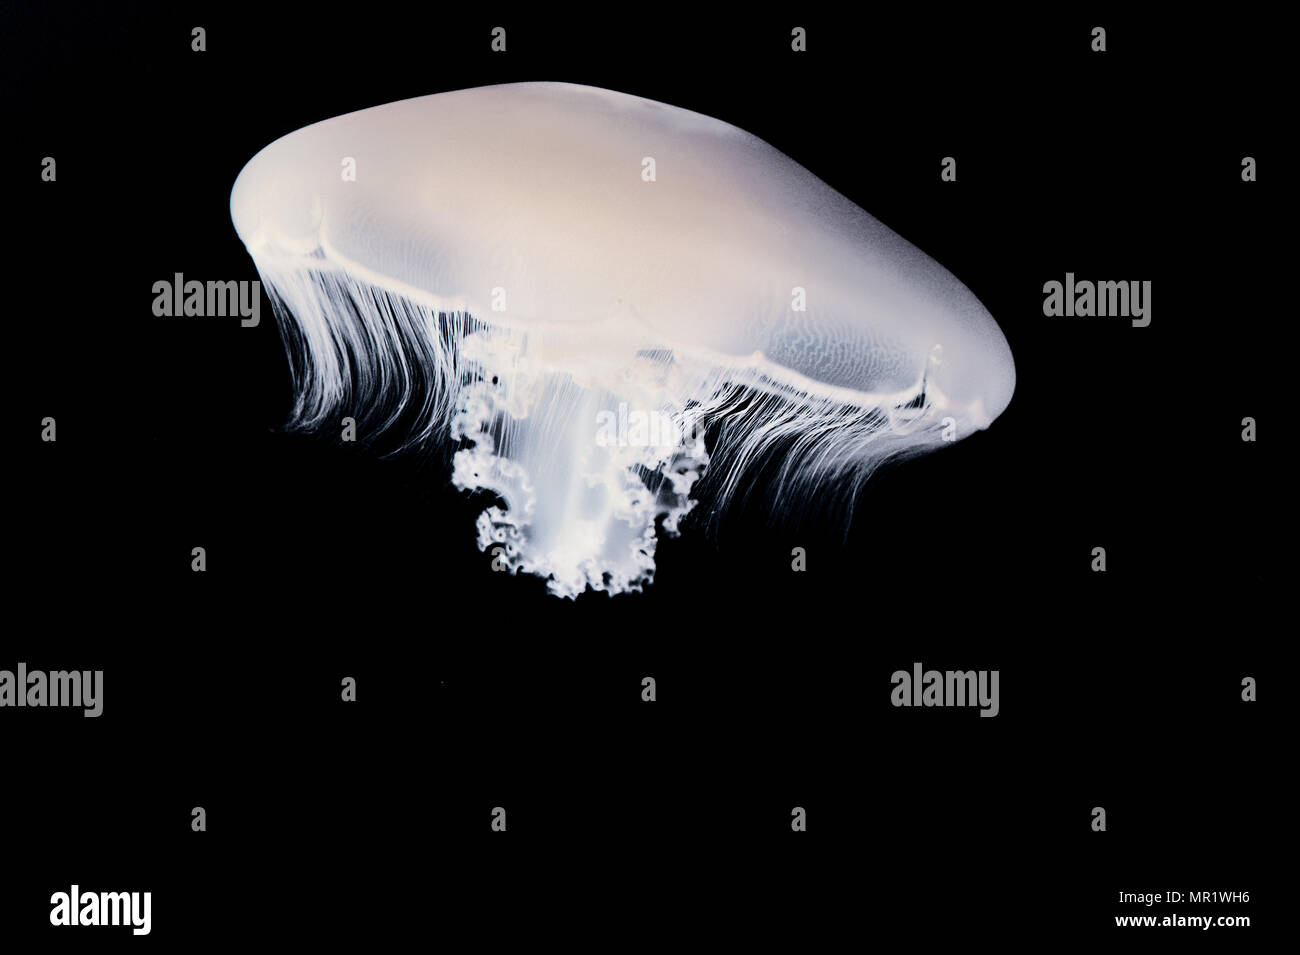 Moon jelly (Aurelia labiata) - Stock Image